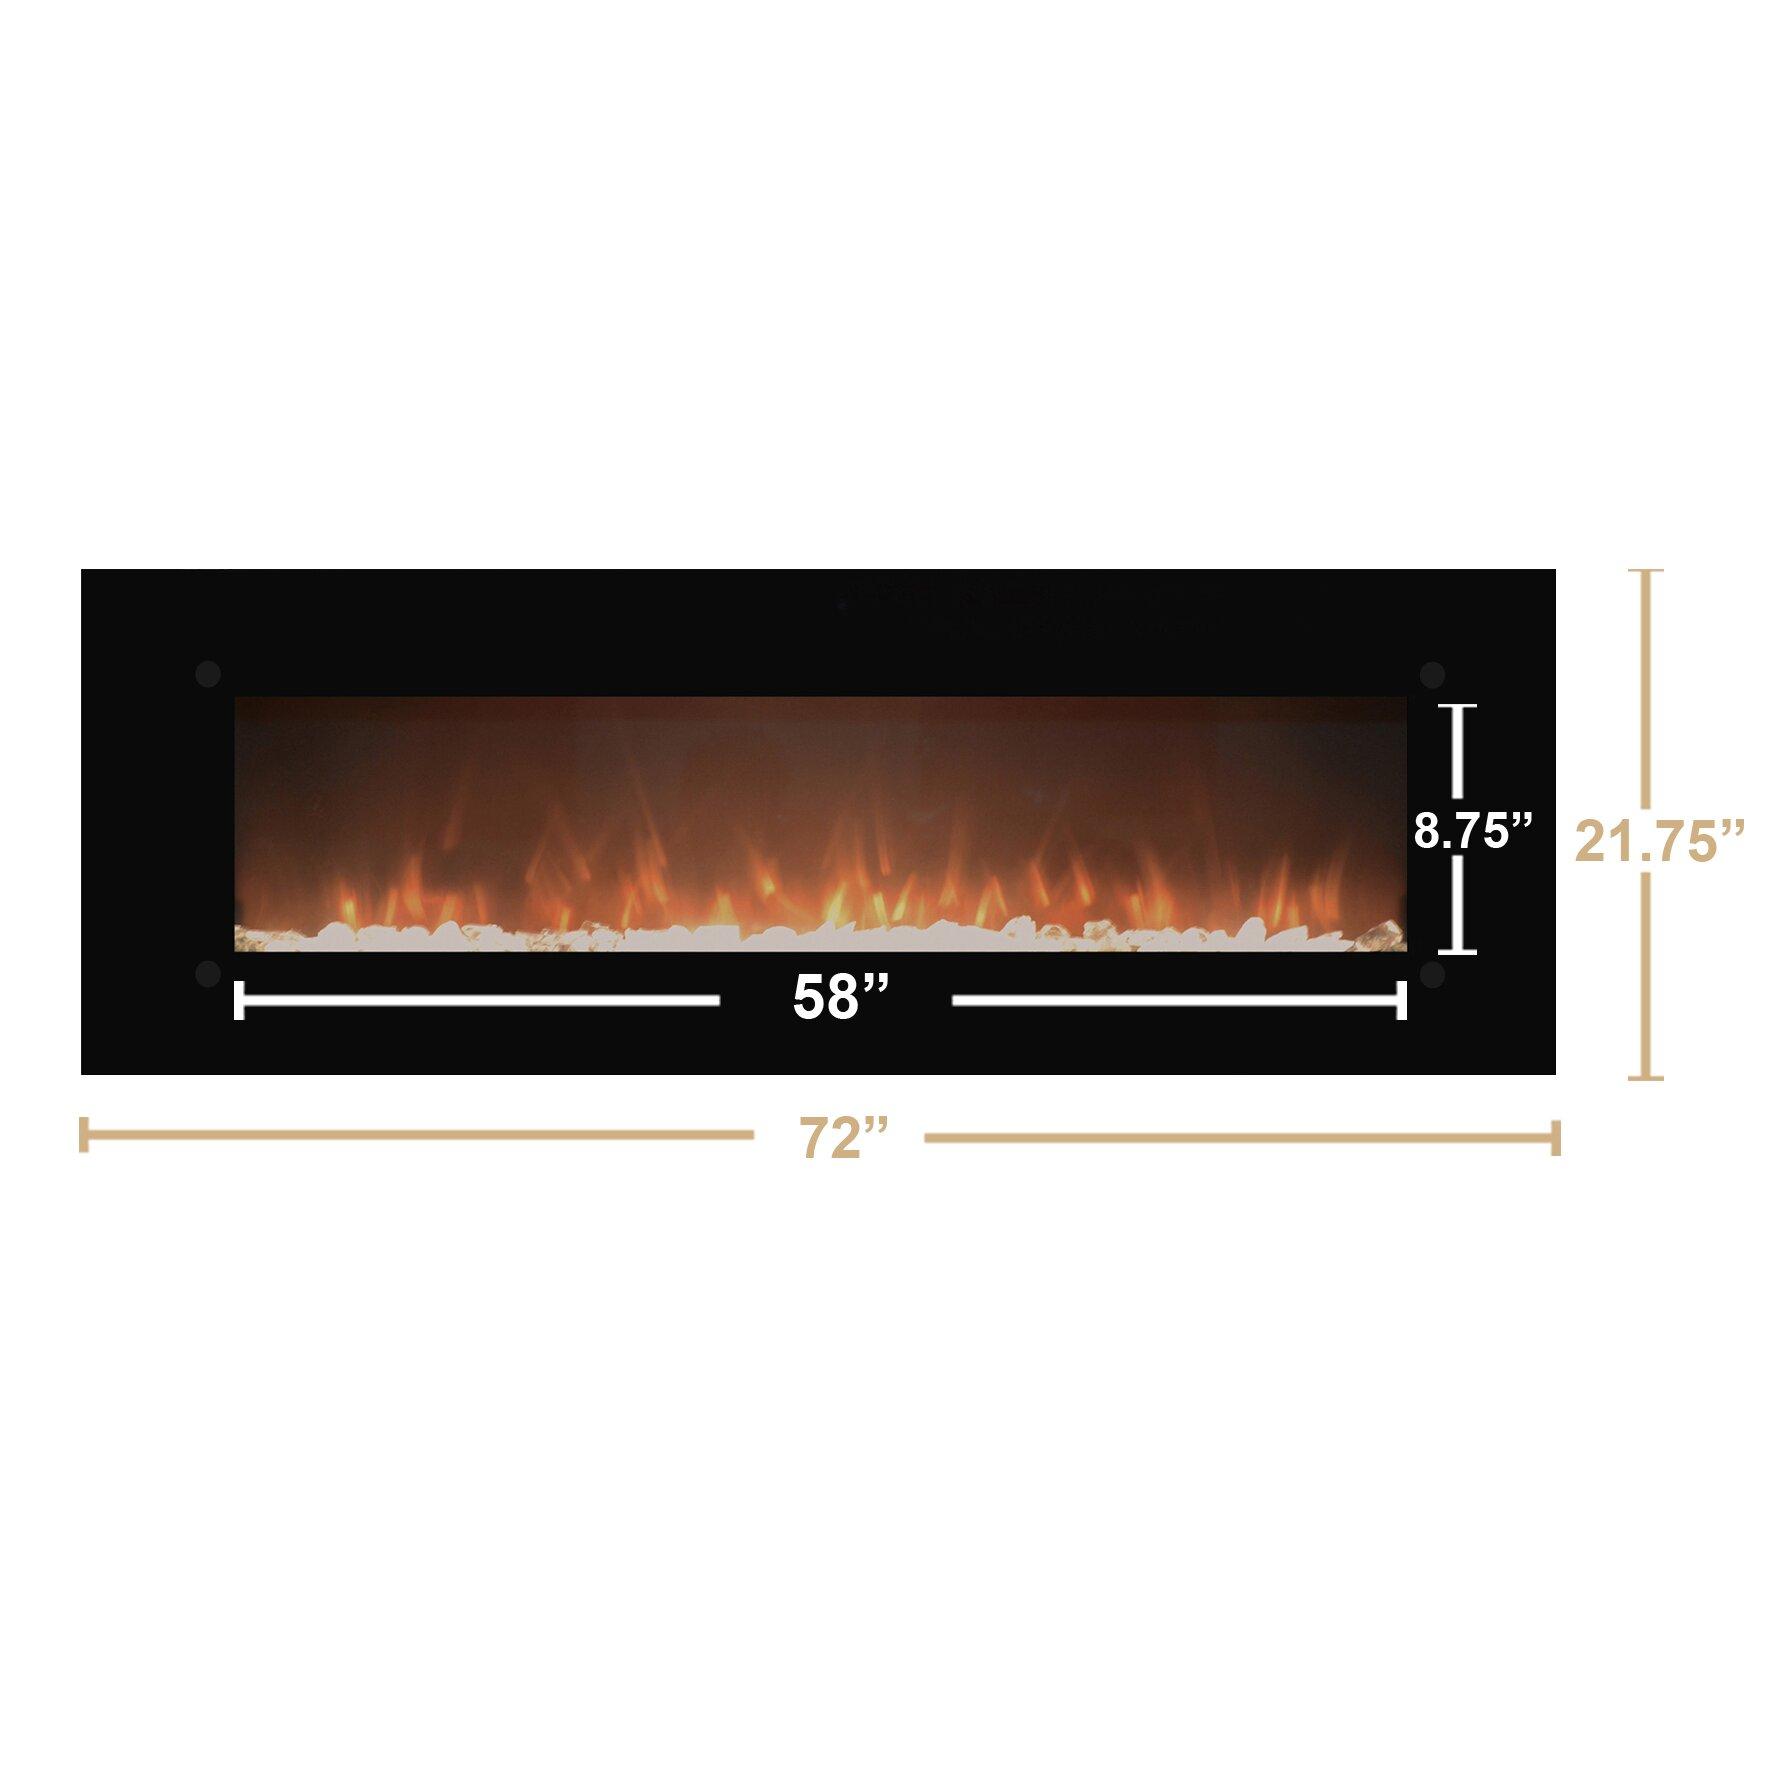 Touchstone Onyxxl Wall Mount Electric Fireplace Reviews Wayfair